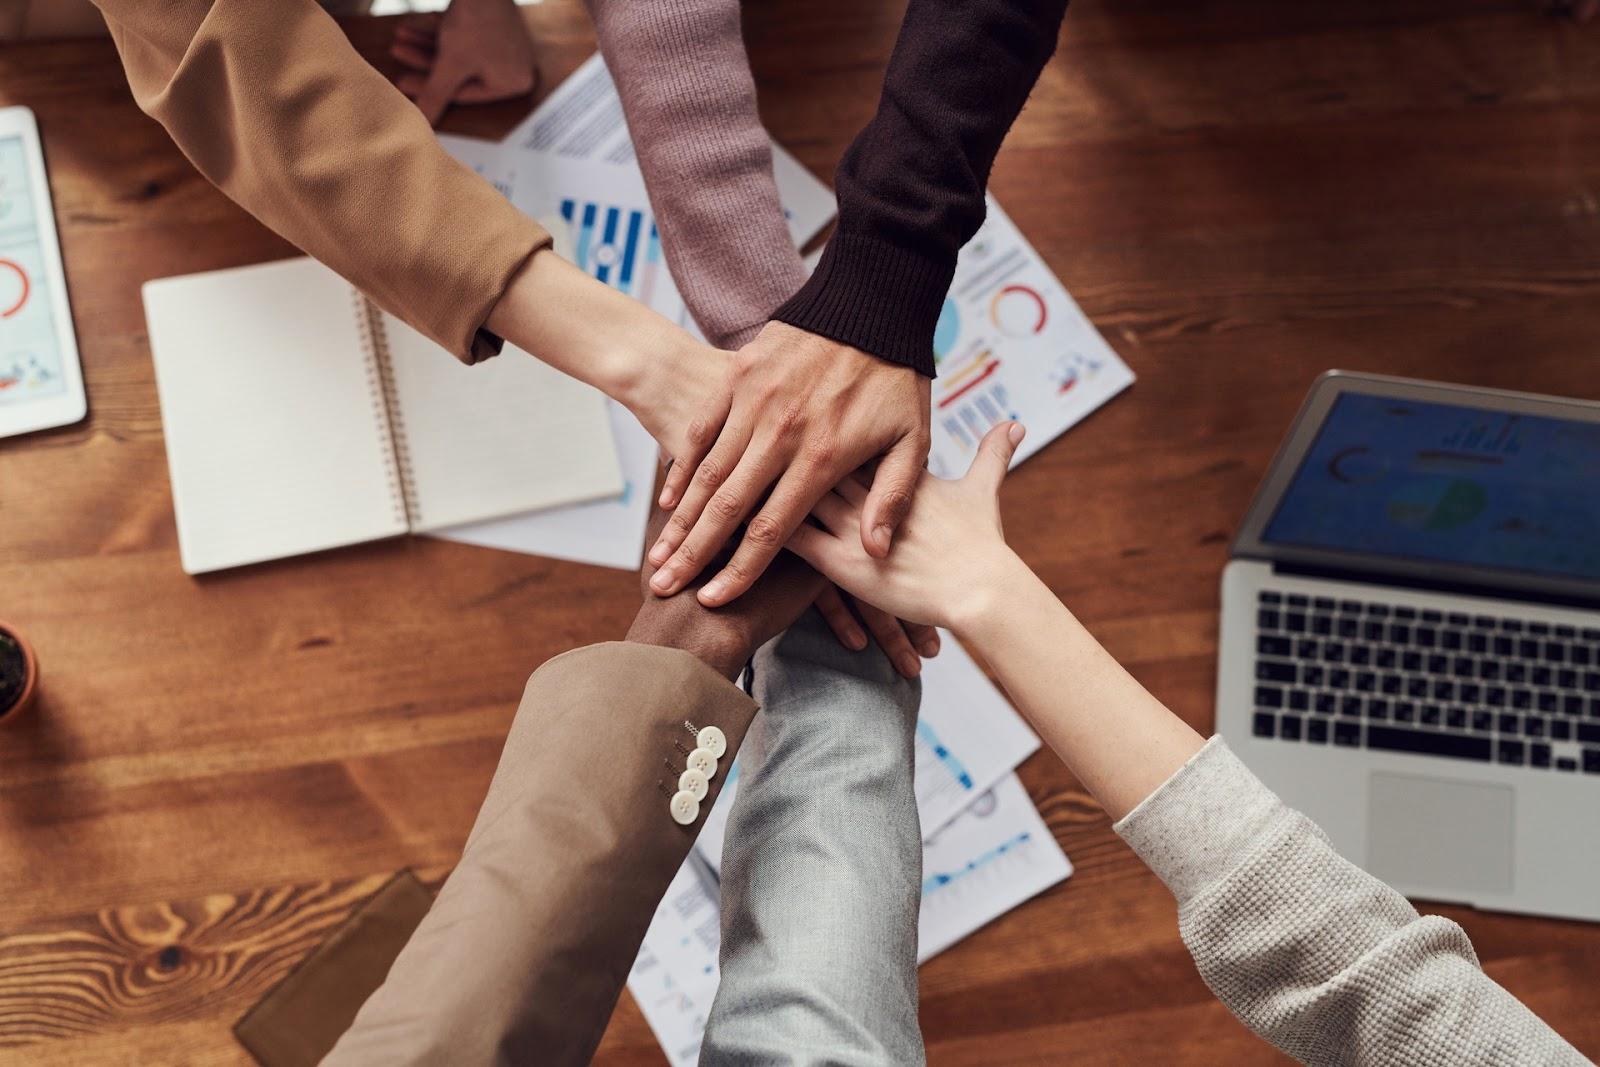 Examine your sales team performance